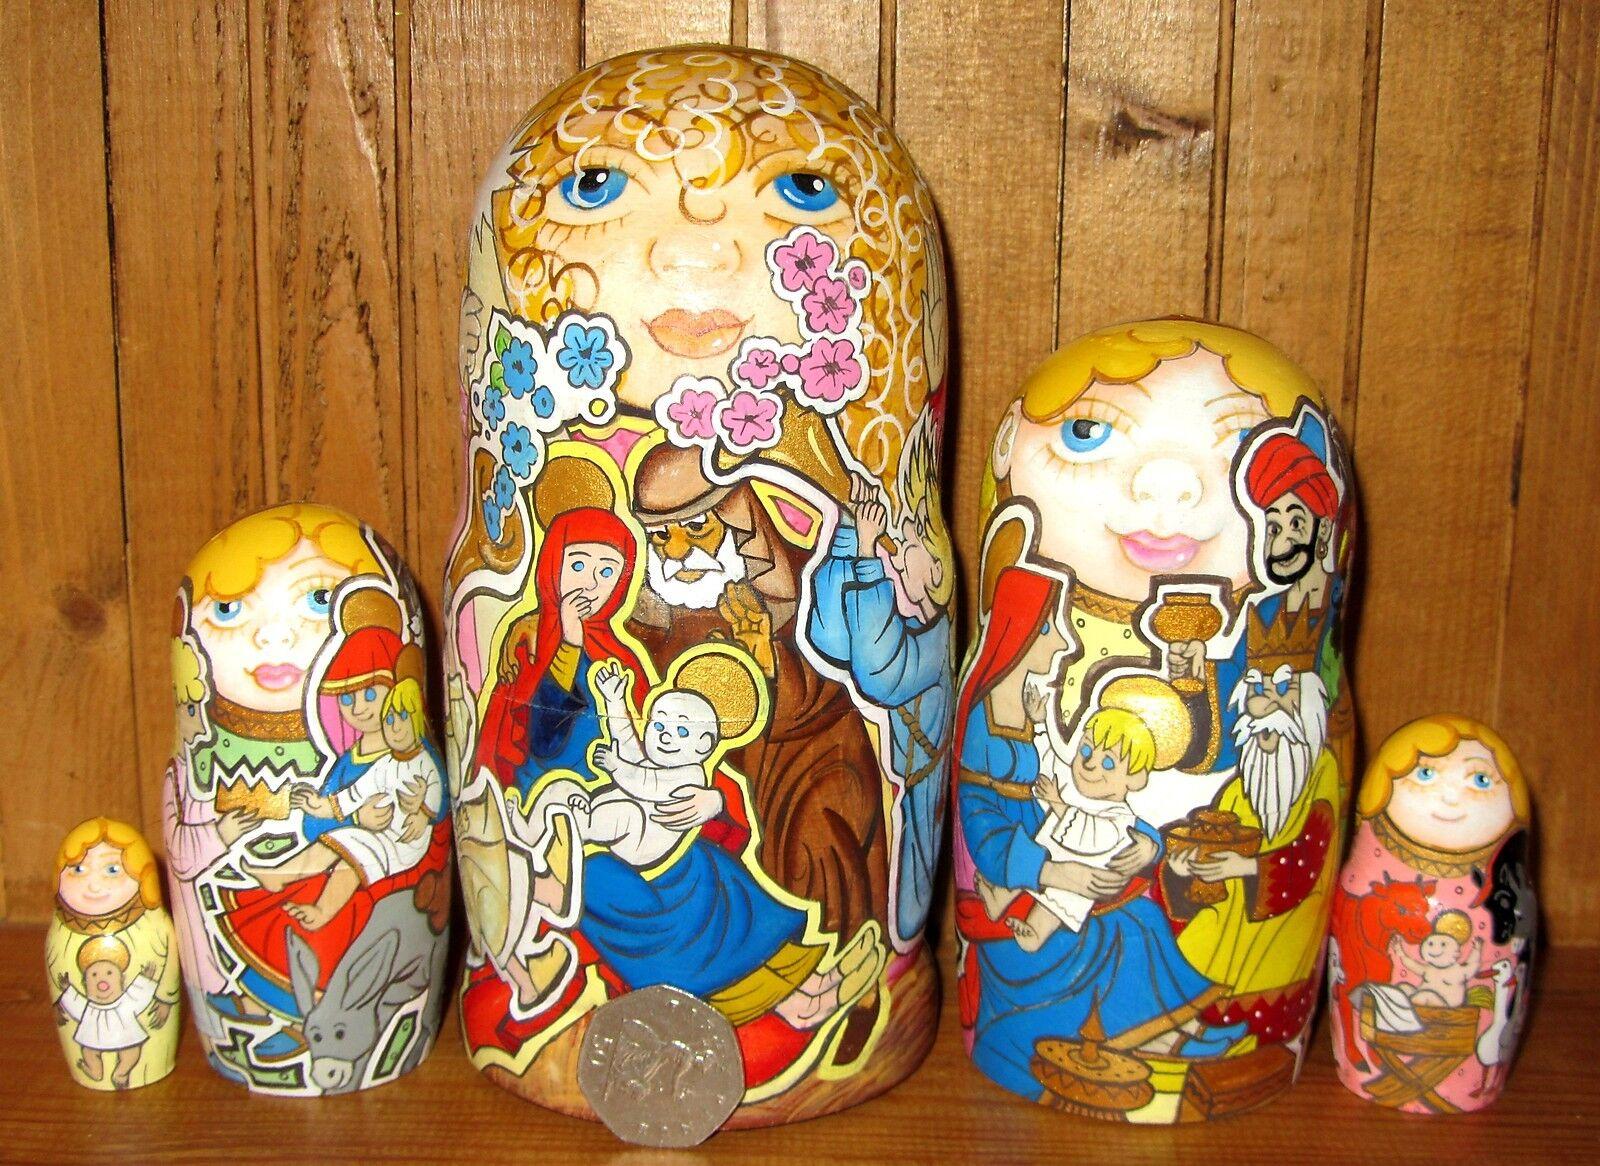 Natividad Niño Jesús María José Ángel MATRYOSHKA Nesting Dolls 5 ruso Firmado